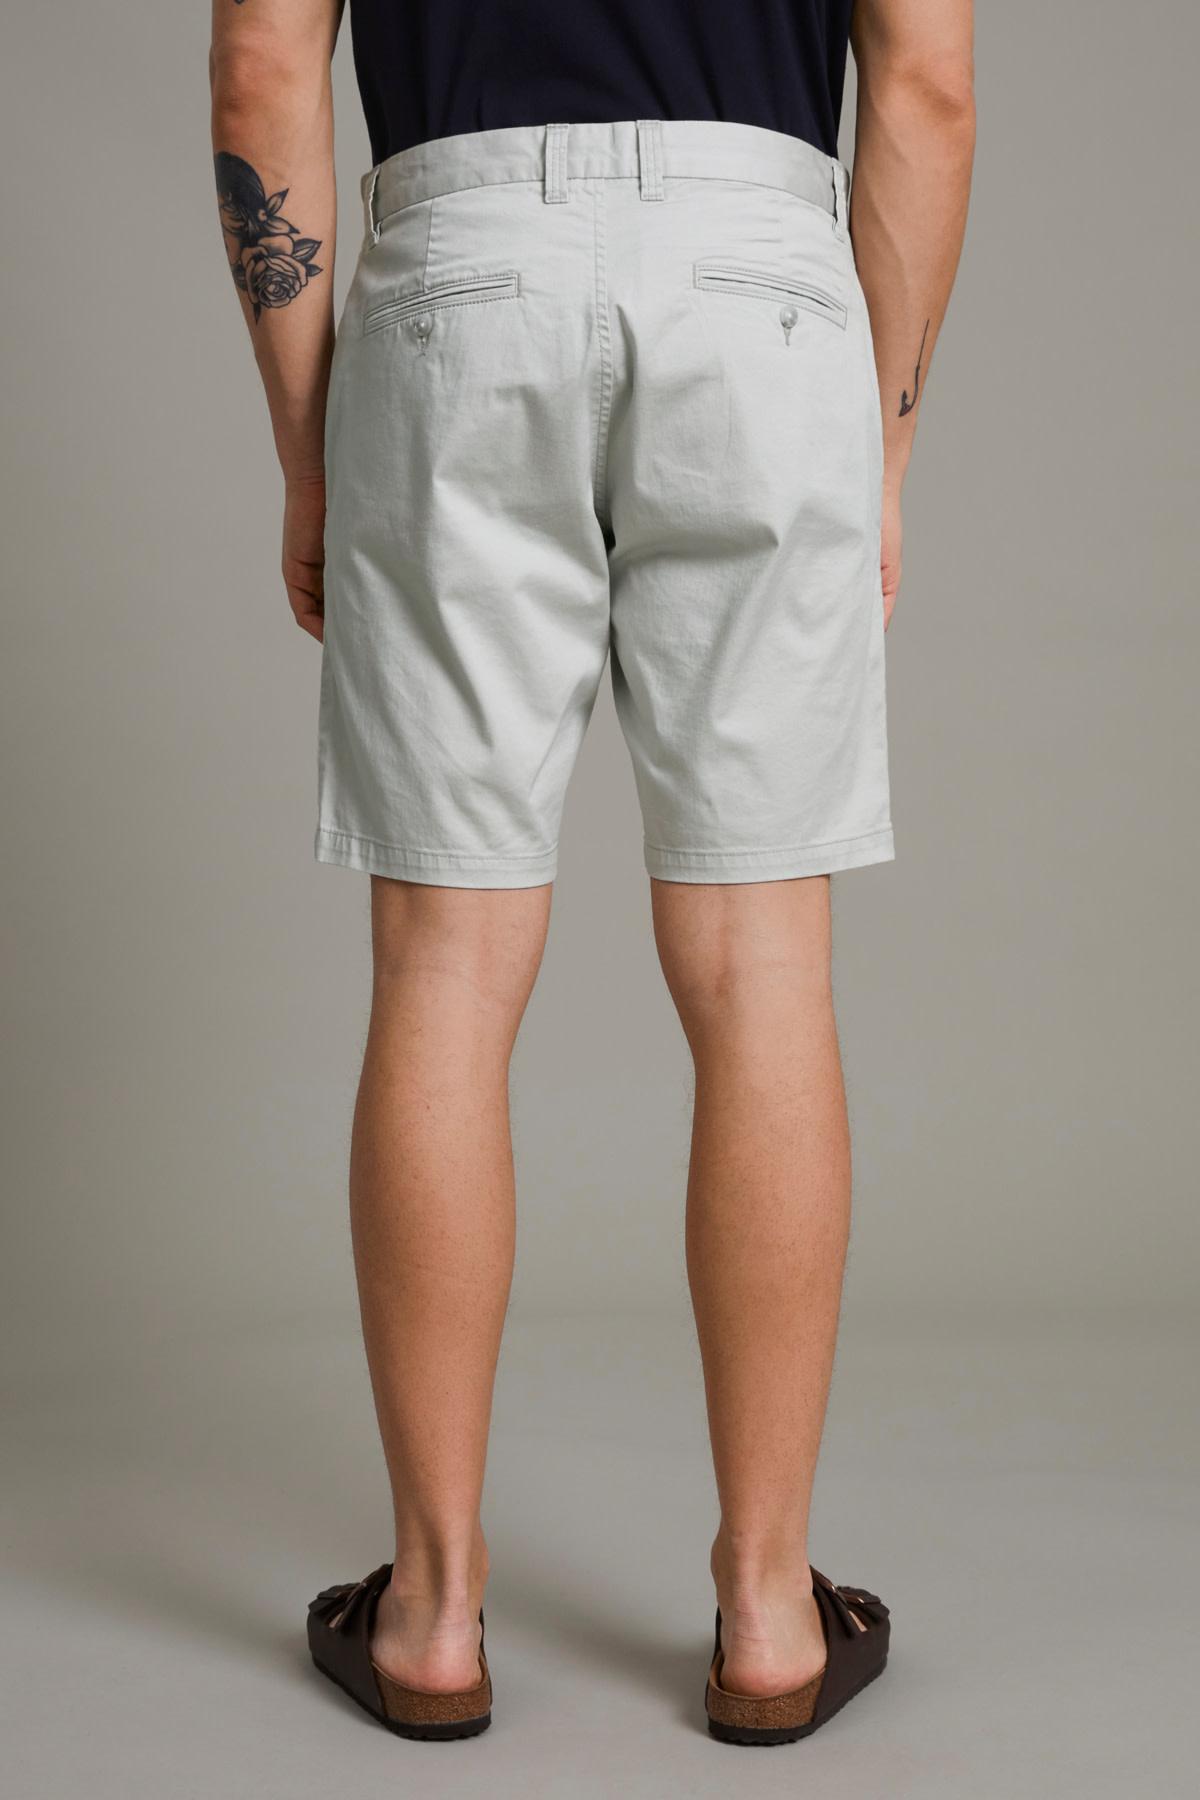 Pristu Chino Shorts - Lunar Rock